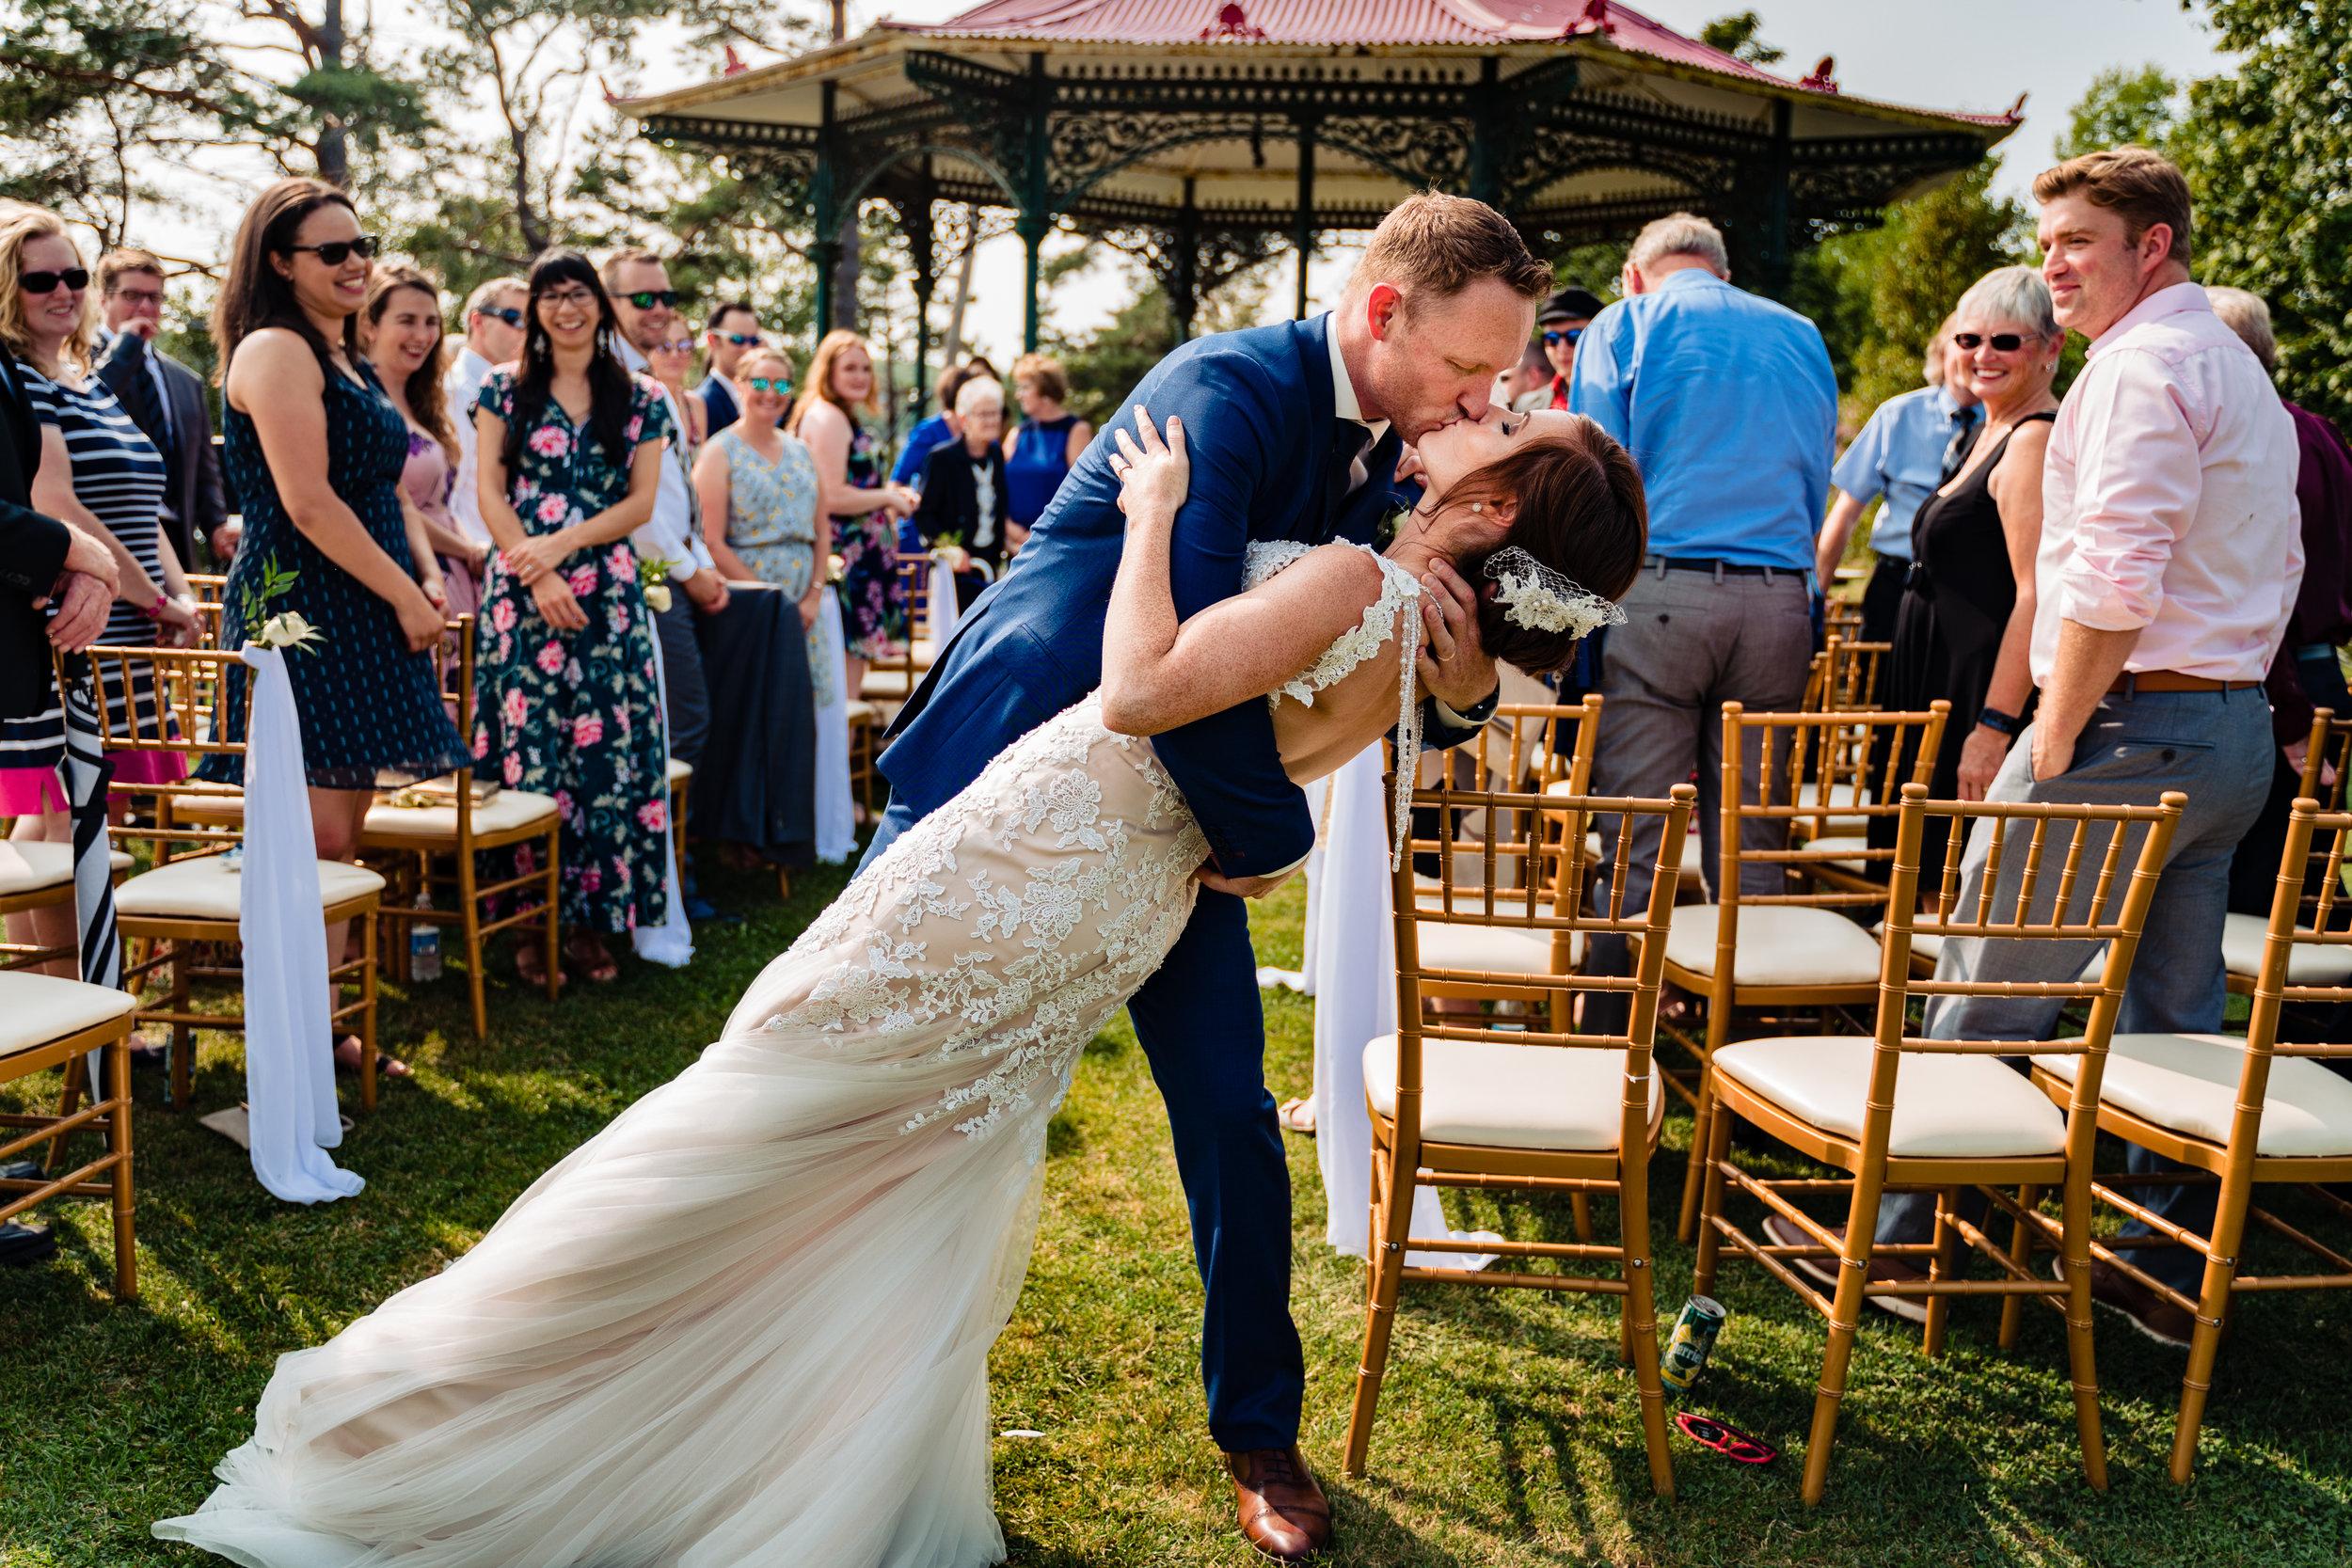 Jenna-Pat-300 (1)halifax-novascotia-weddingphotography-wedding-foxandfellow.jpg